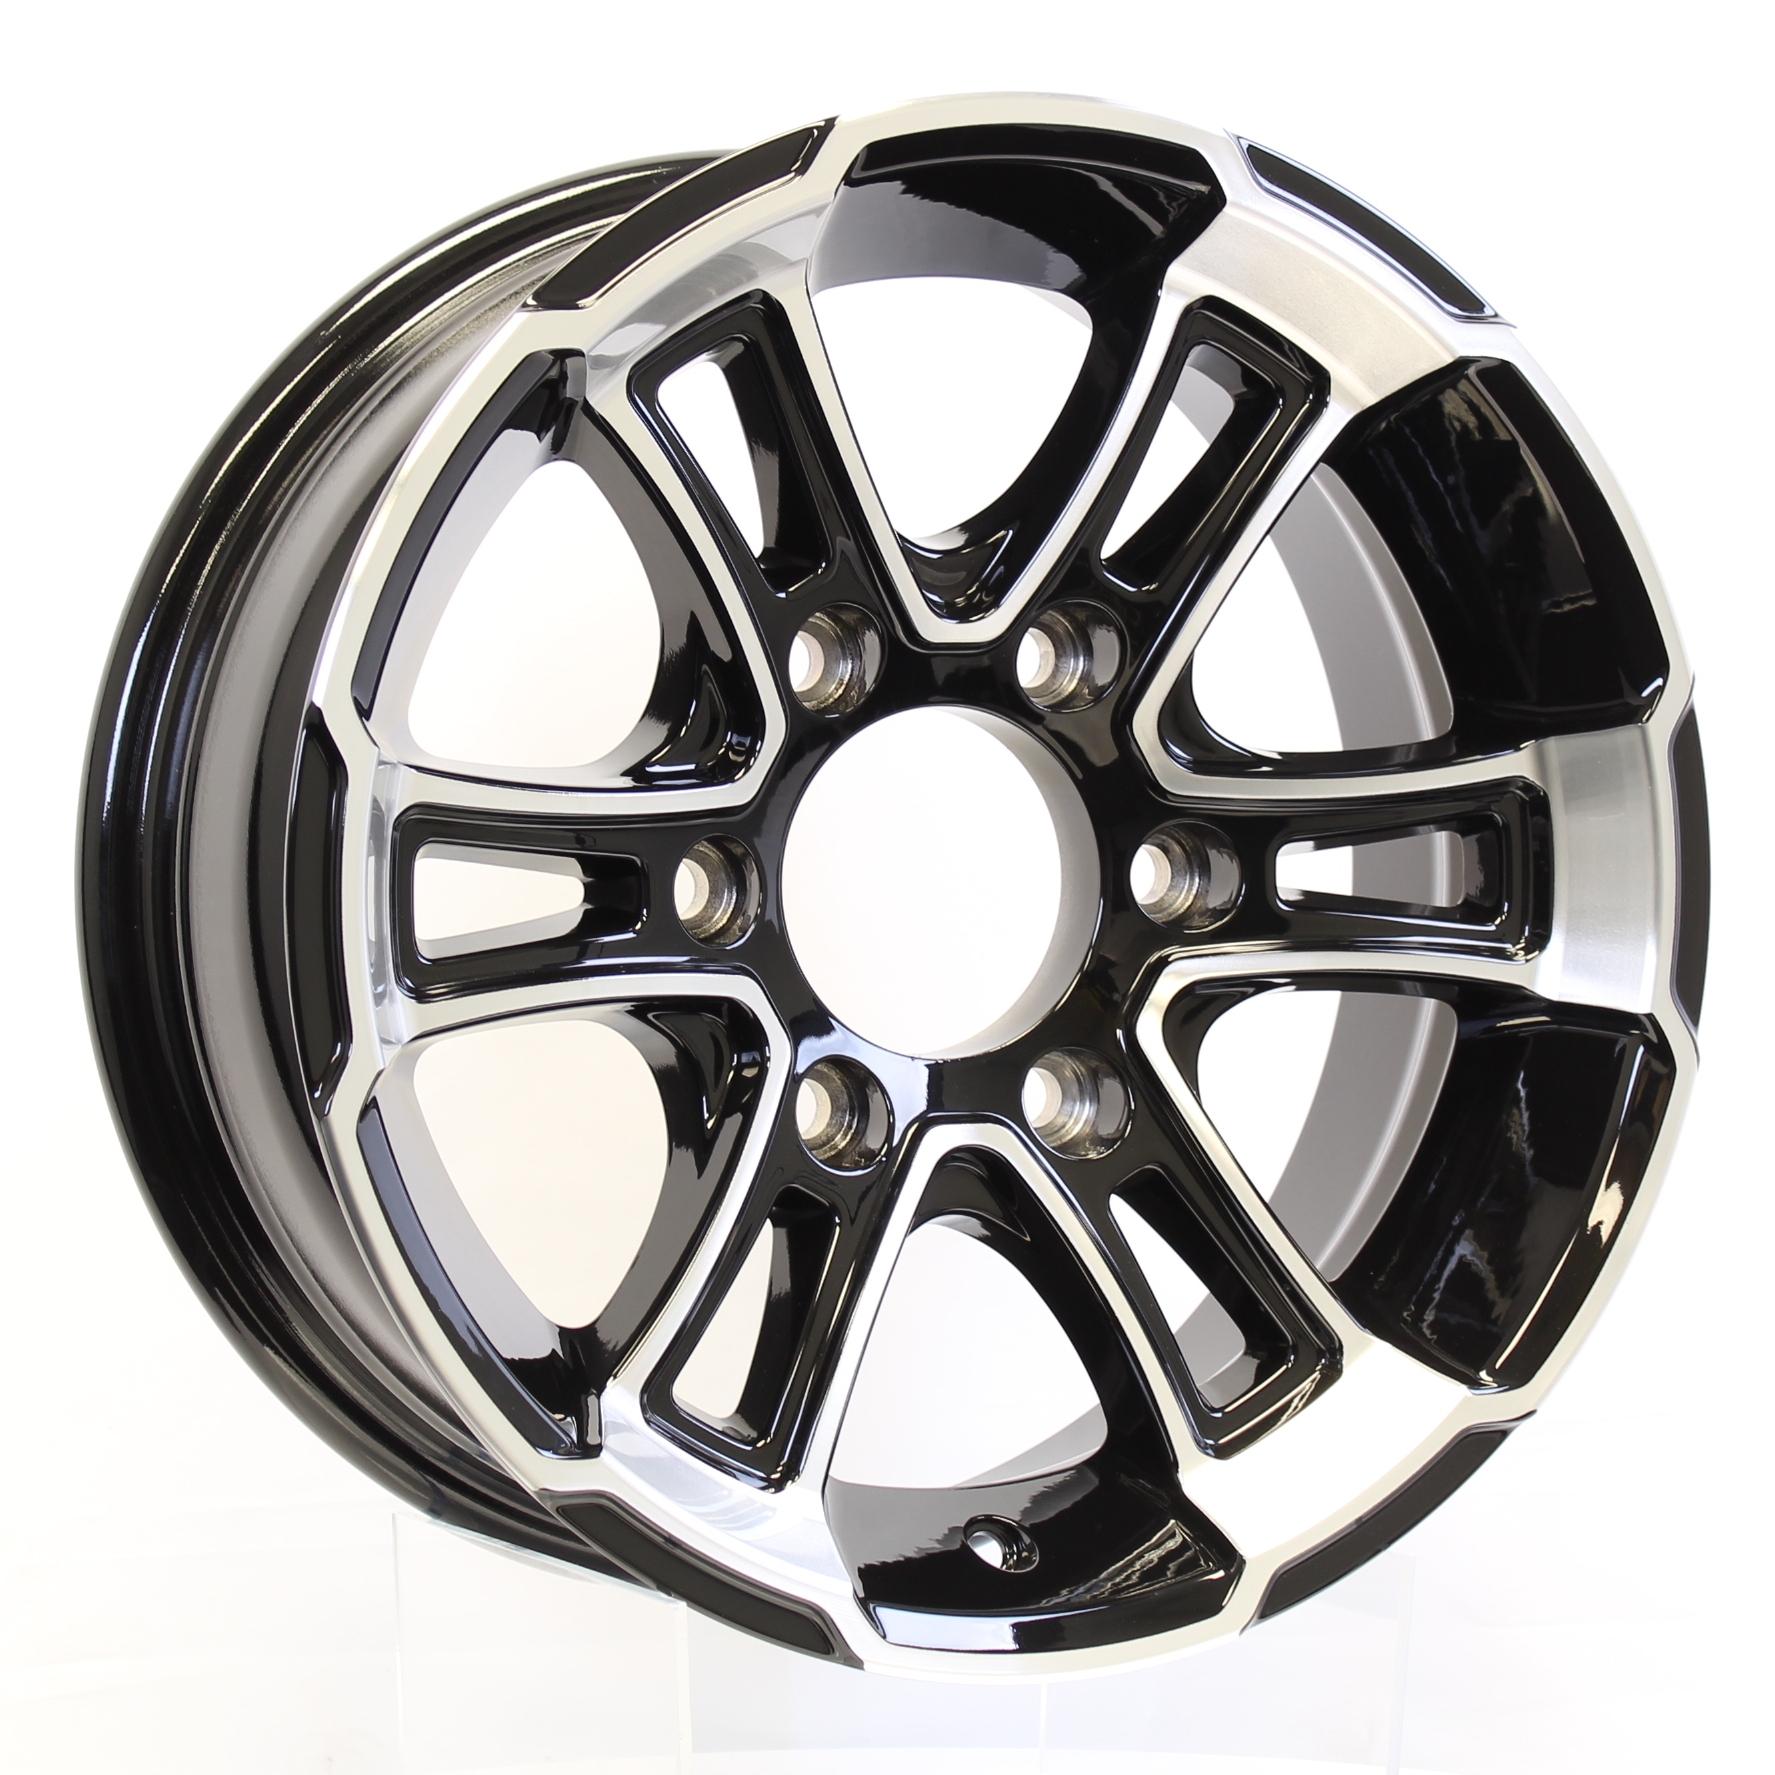 Whitehawk 15x6 6-5.5 Black Aluminum Trailer Wheel Image